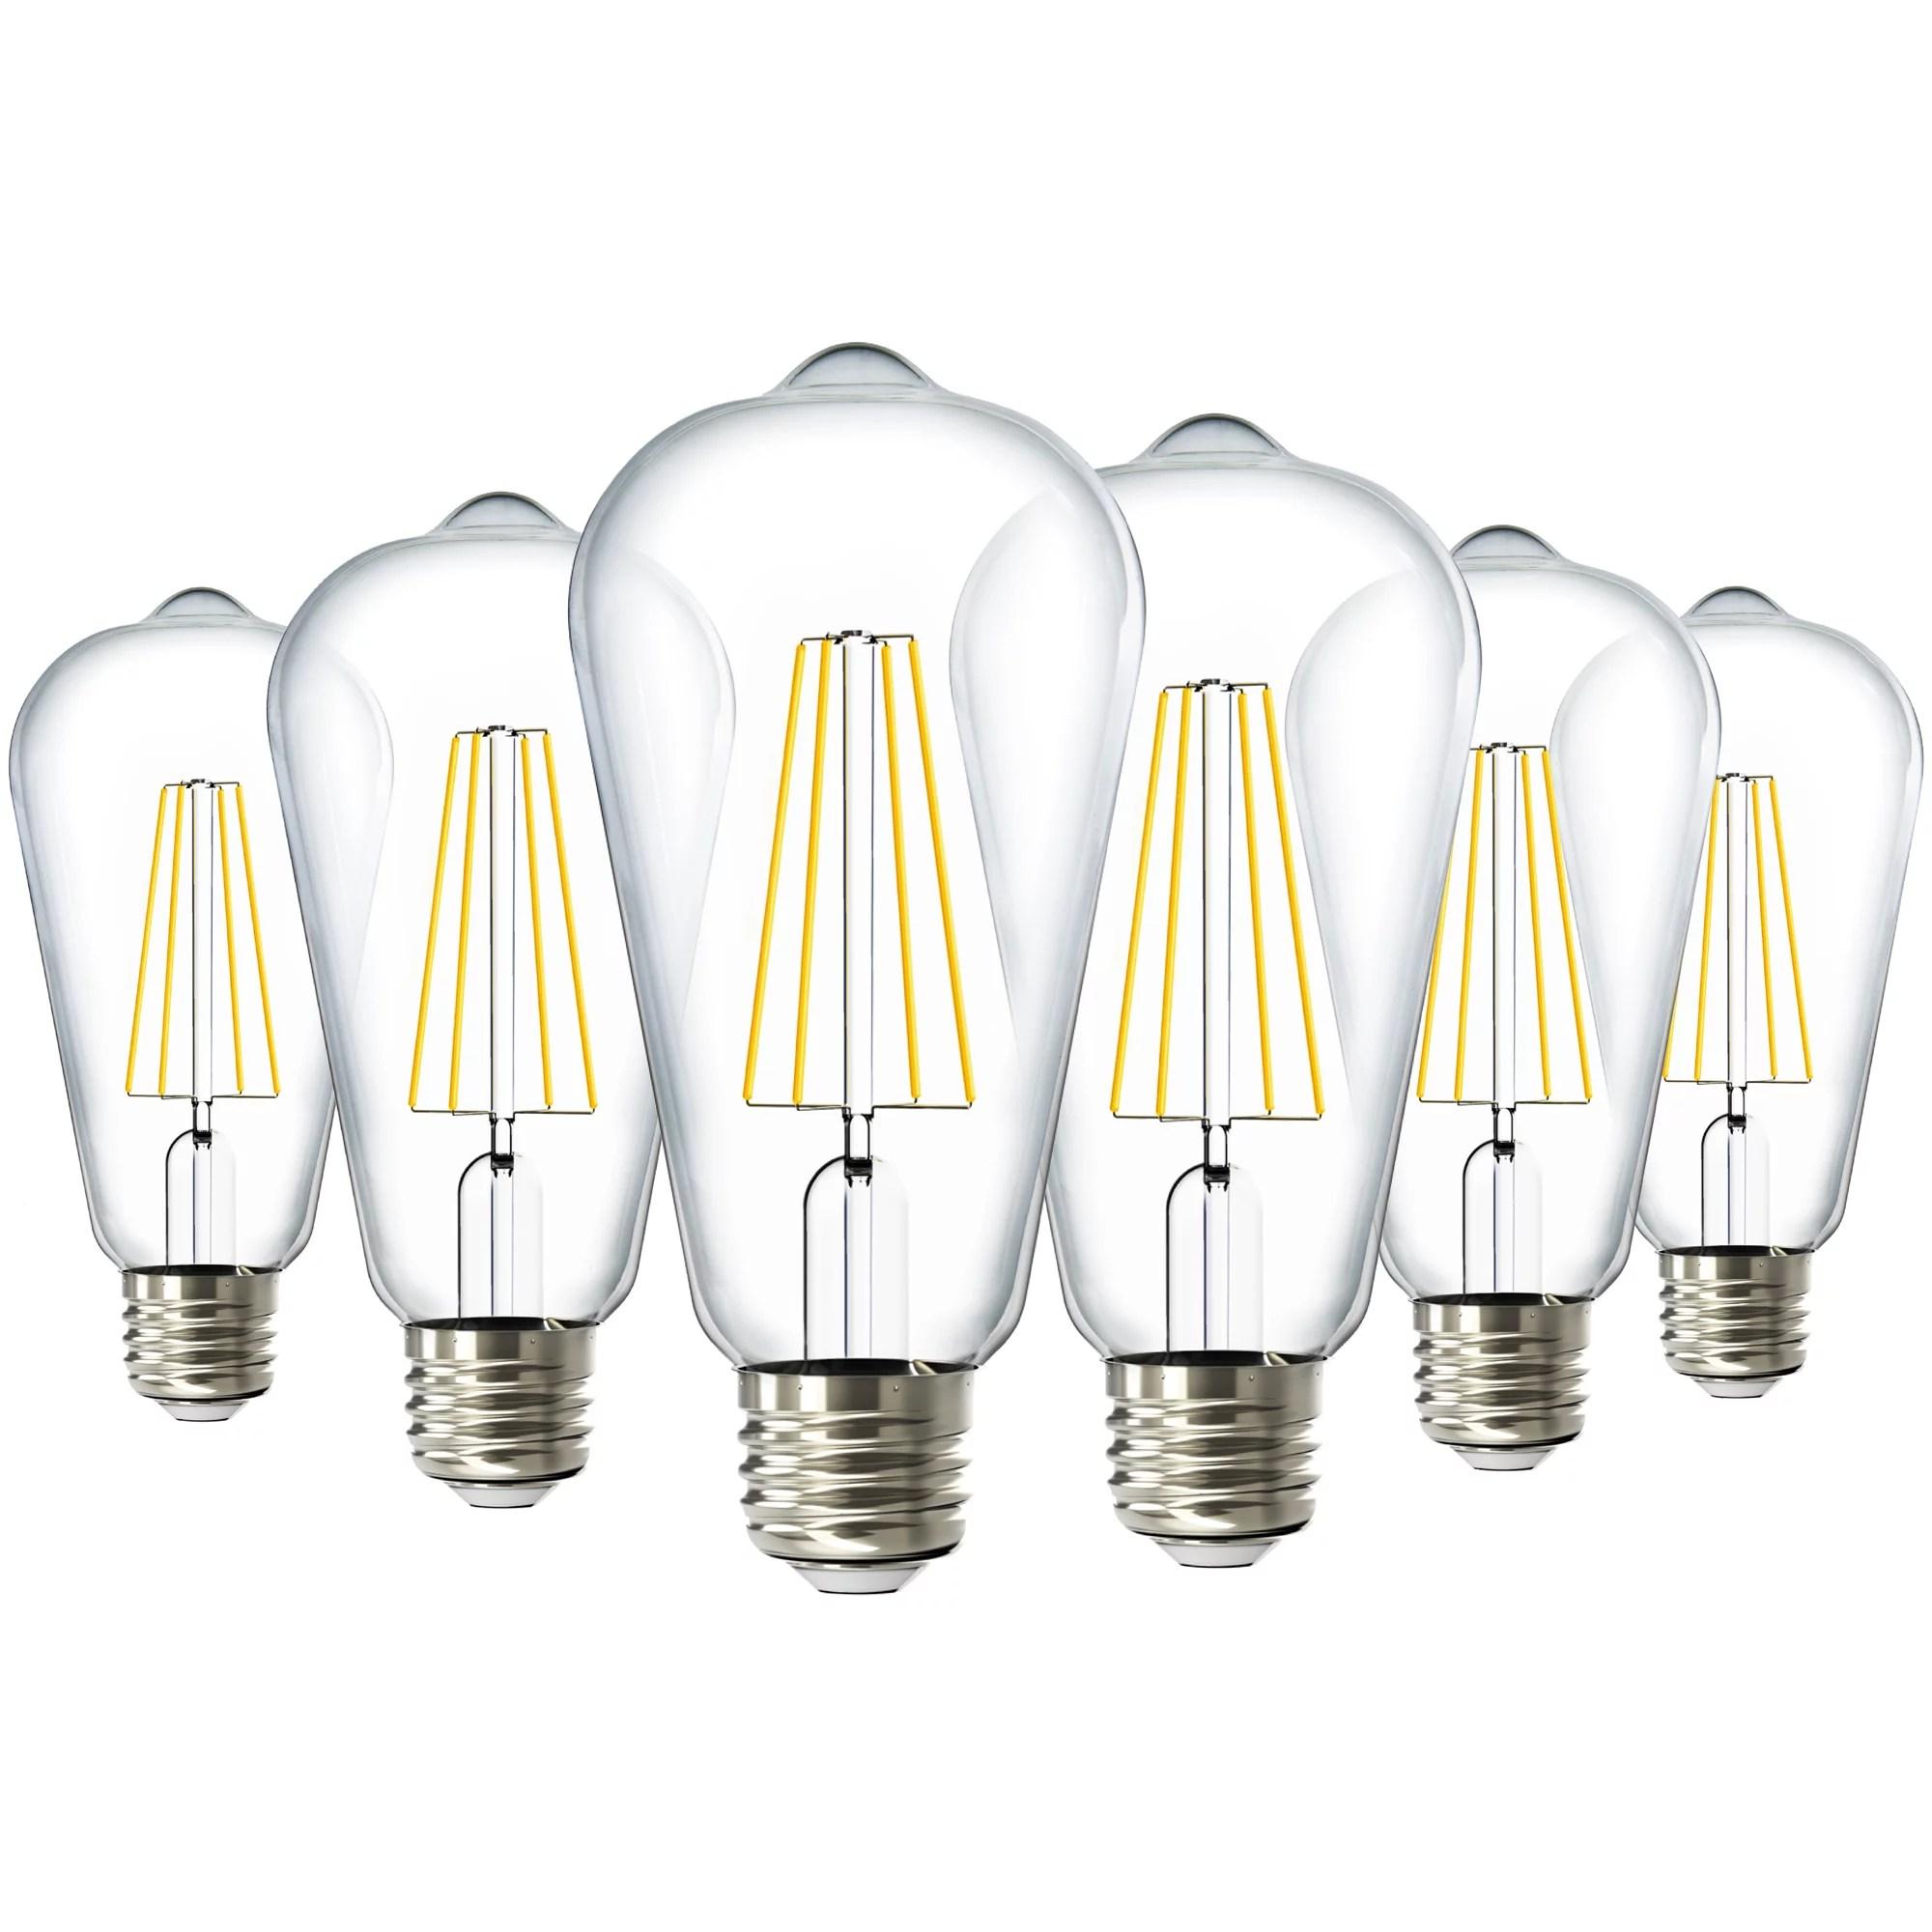 sunco lighting 6 pack st64 led bulb dimmable 8 5w 60w 3000k warm white vintage edison filament bulb 800 lm e26 base restaurant or string lights